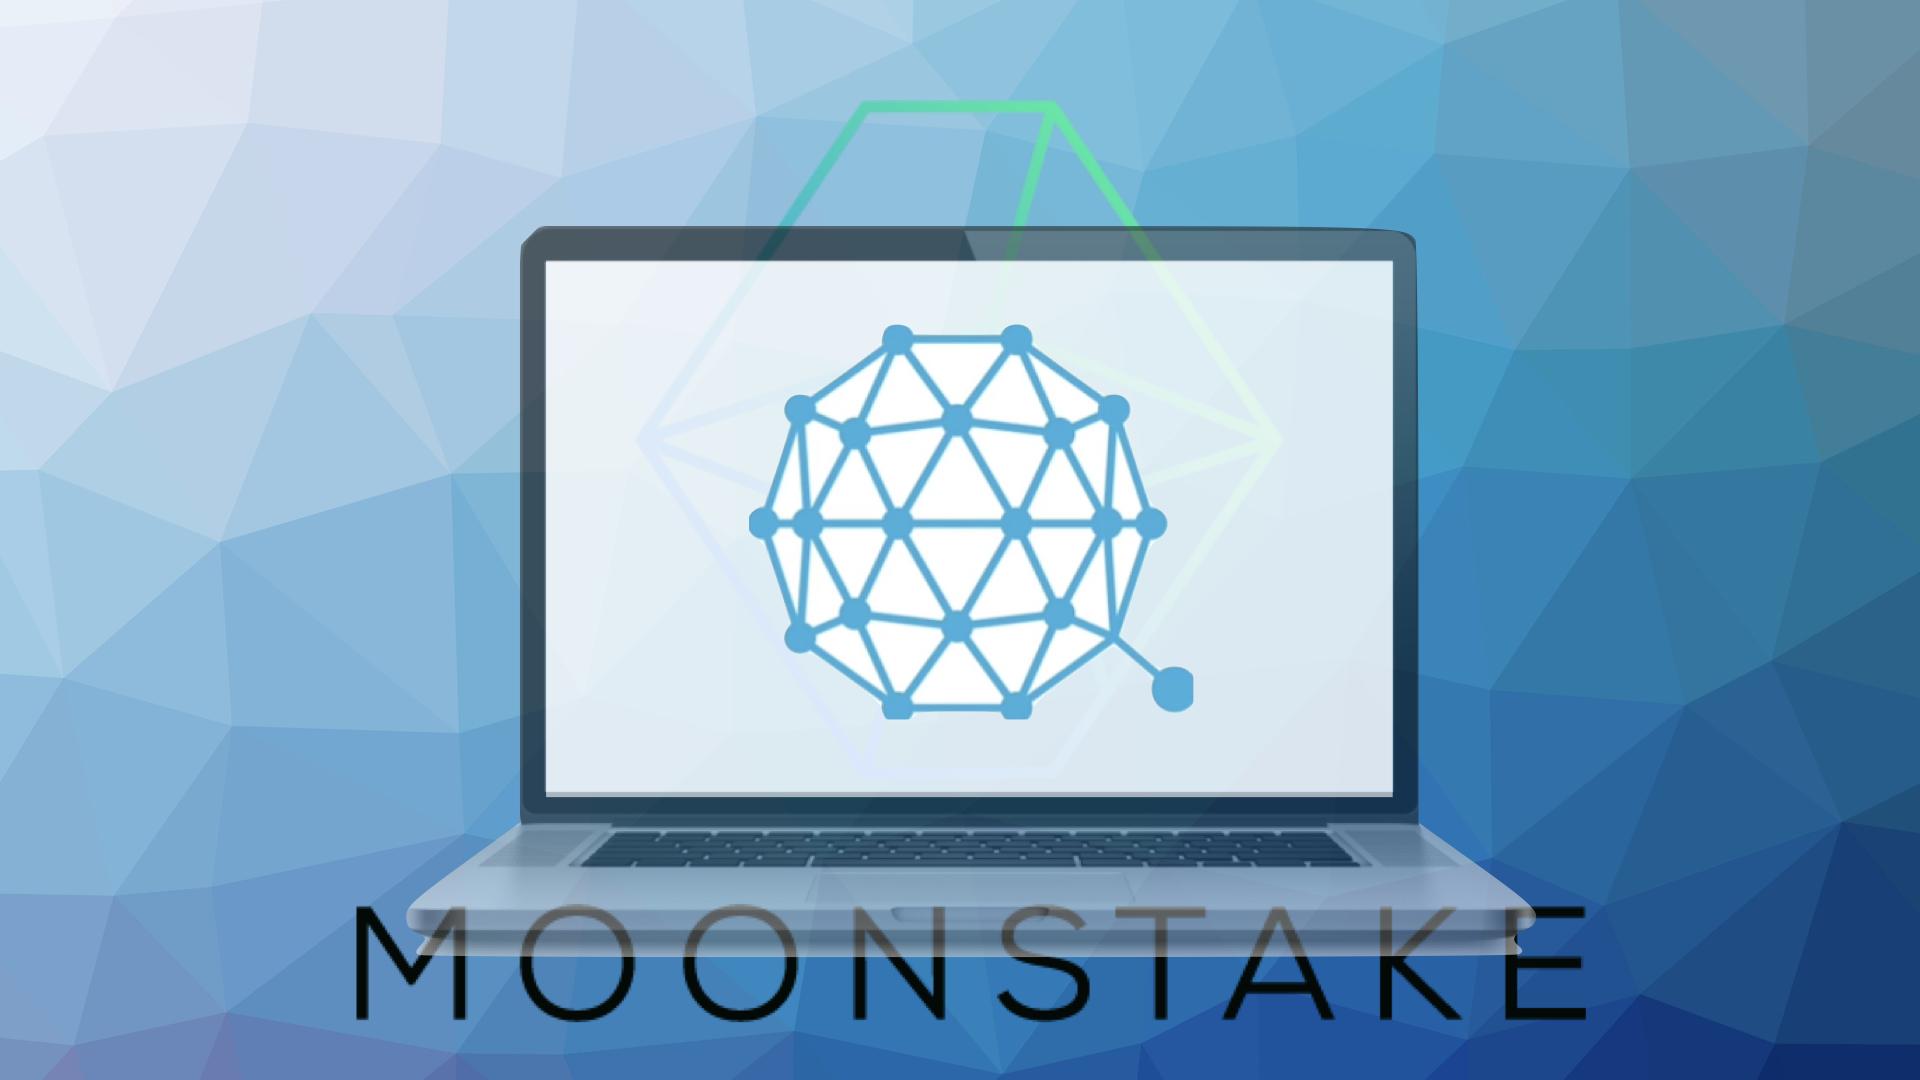 Moonstake.io